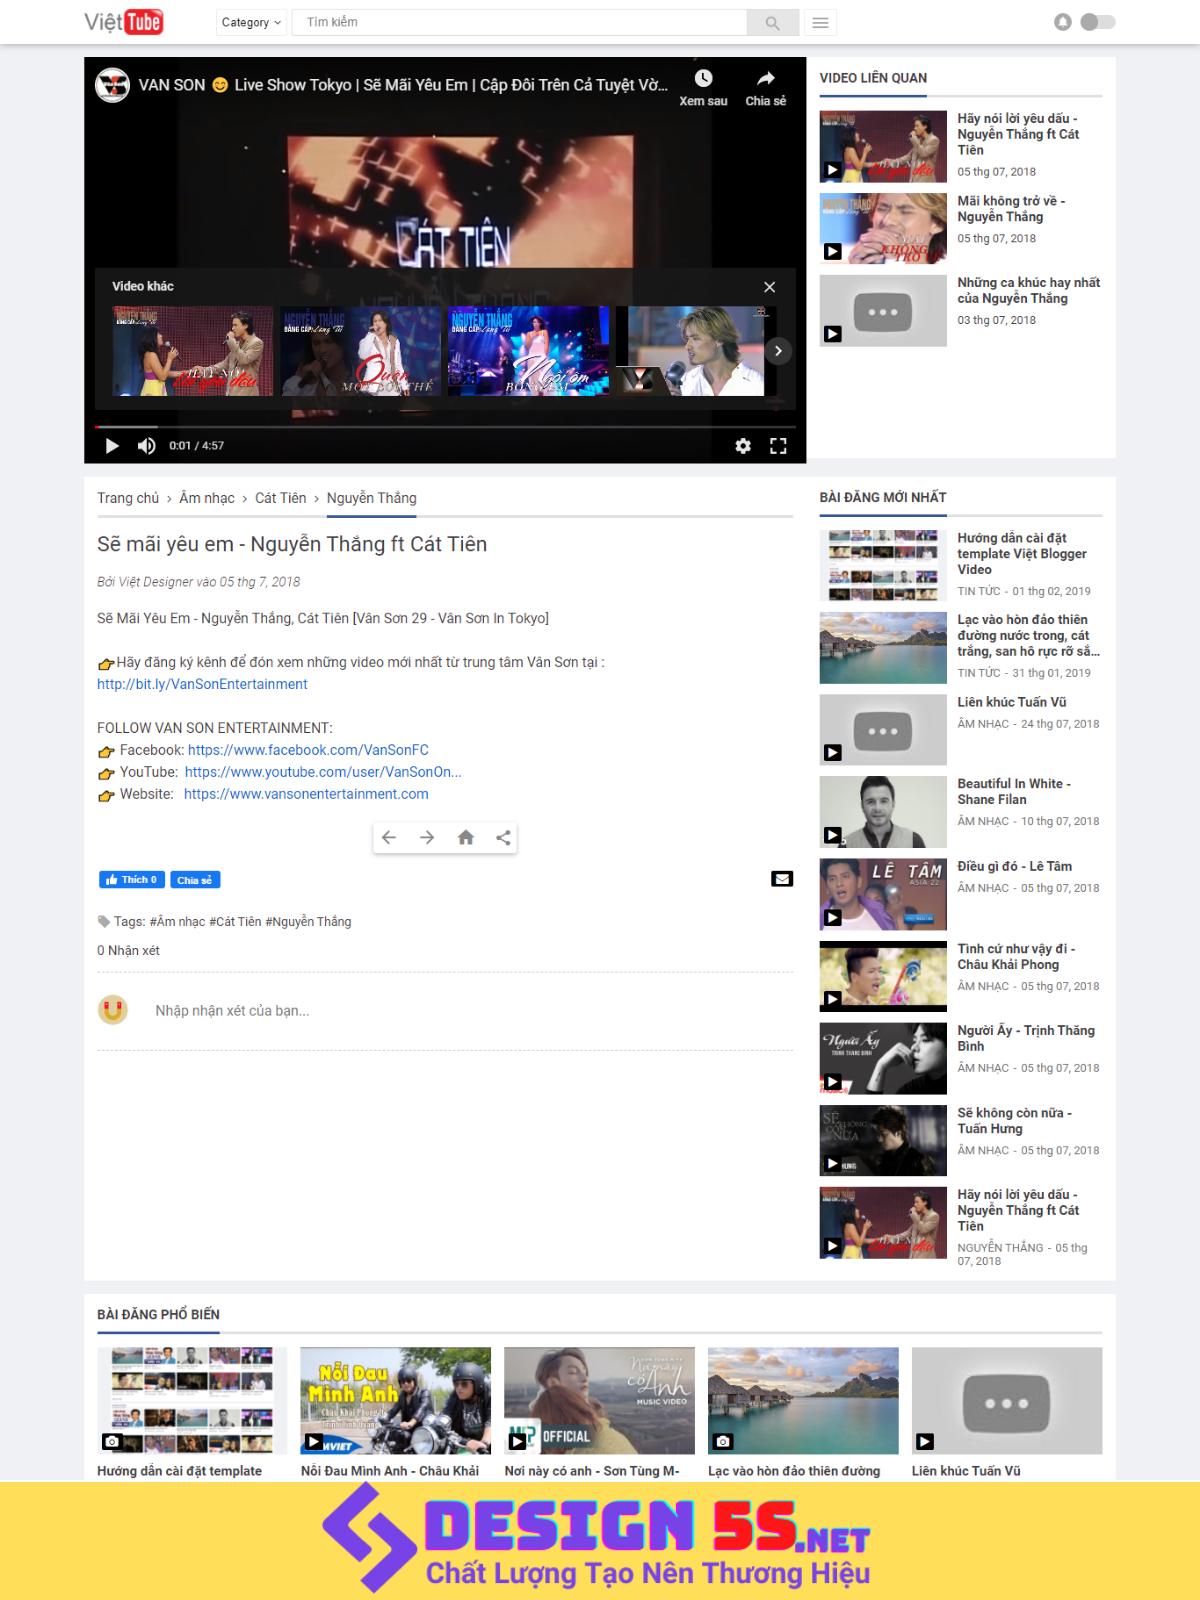 YouTube API Video Blogger Template Version 3.0 - Ảnh 2